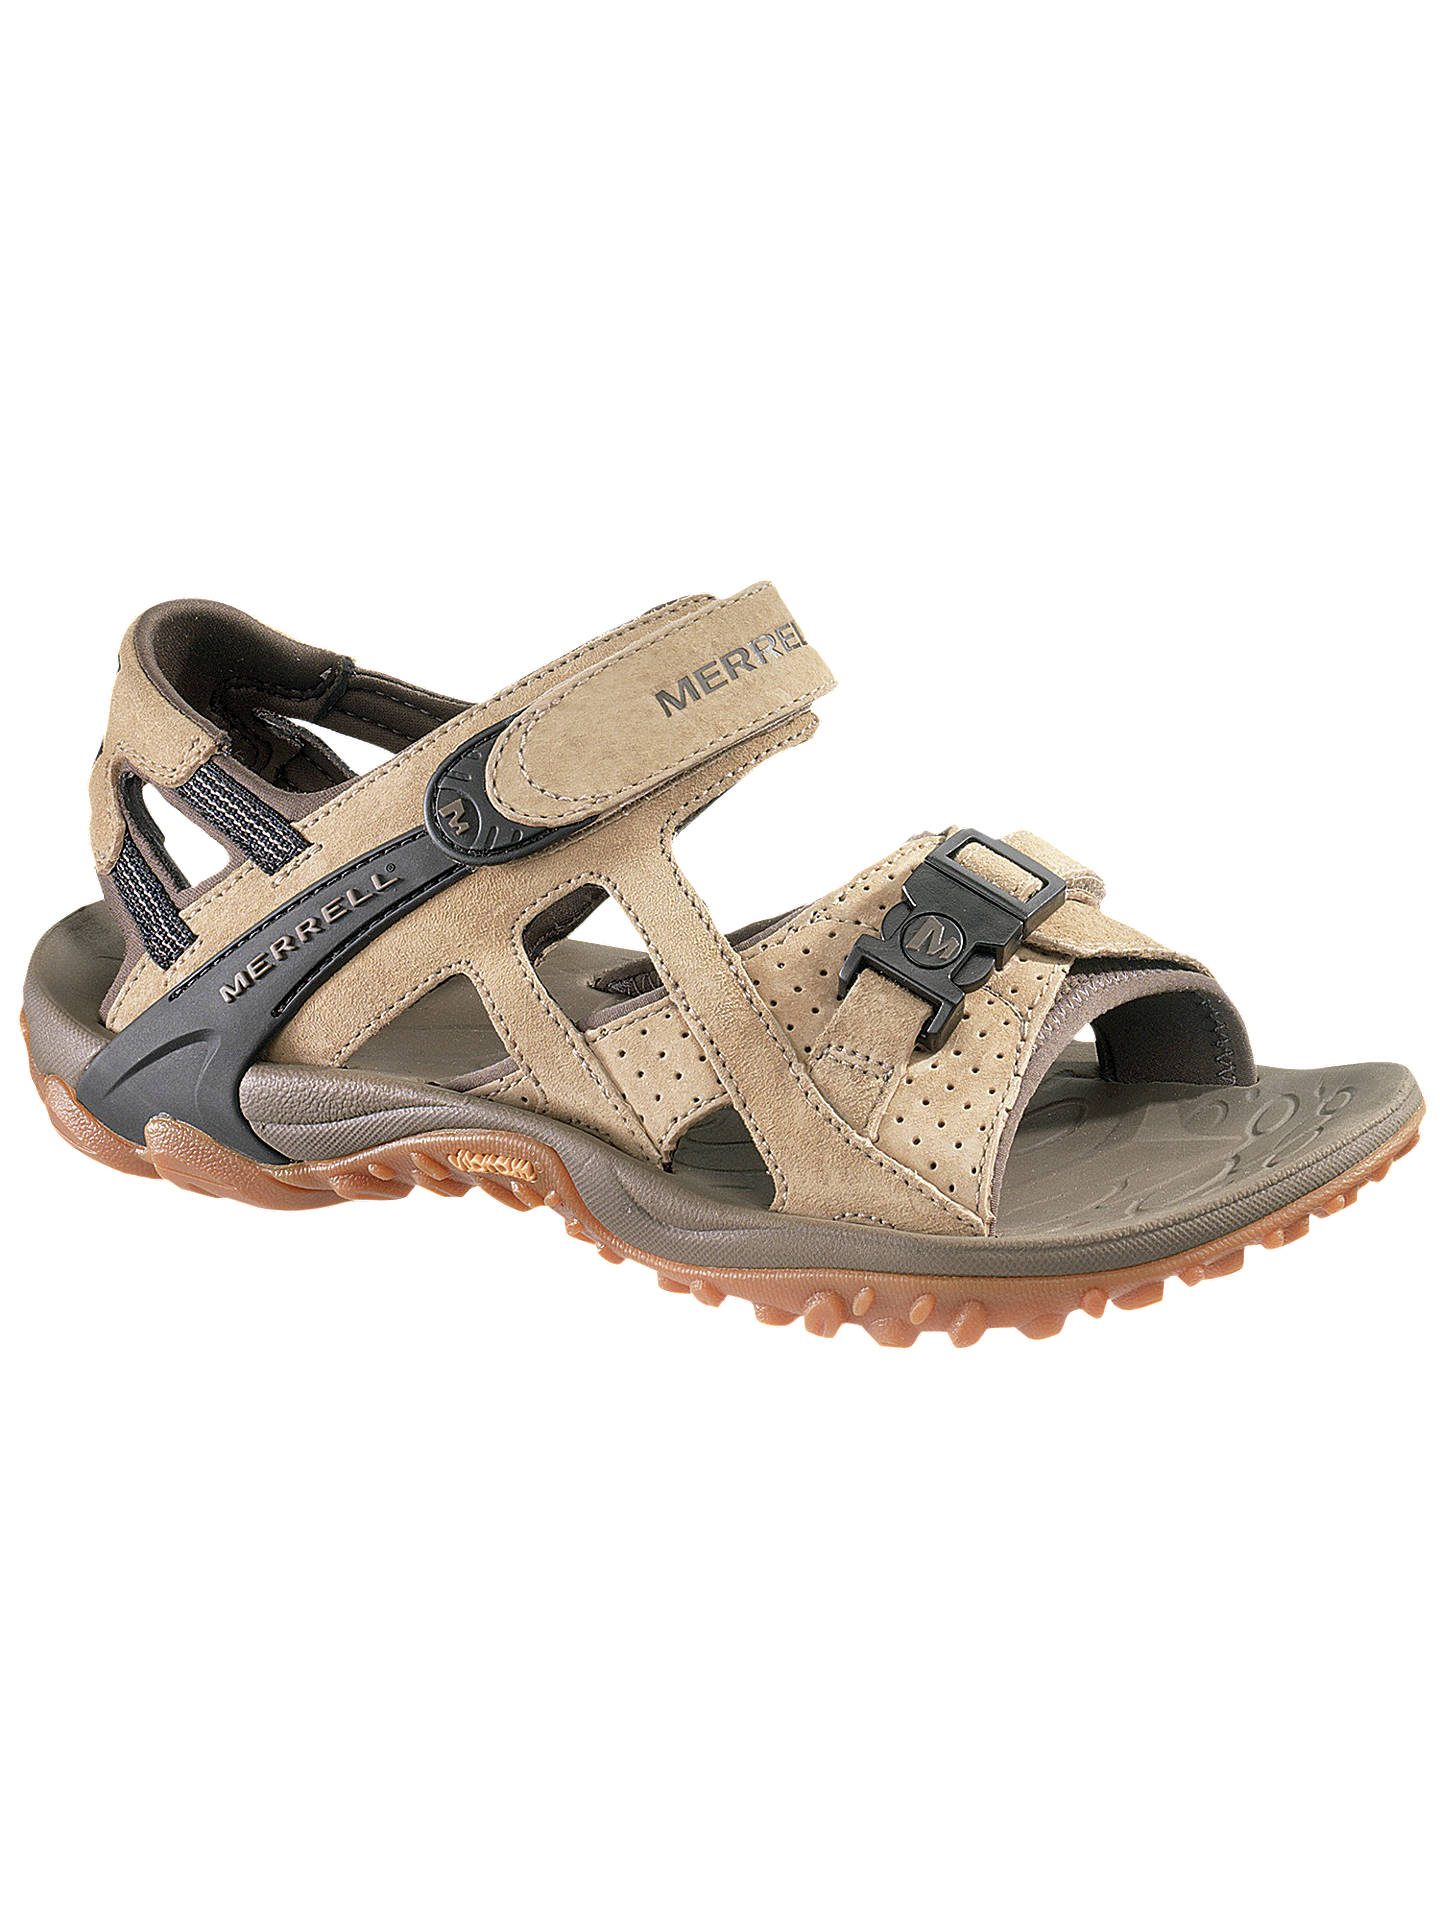 06f2aa22e465 Buy Merrell Kahuna III Men s Sandals